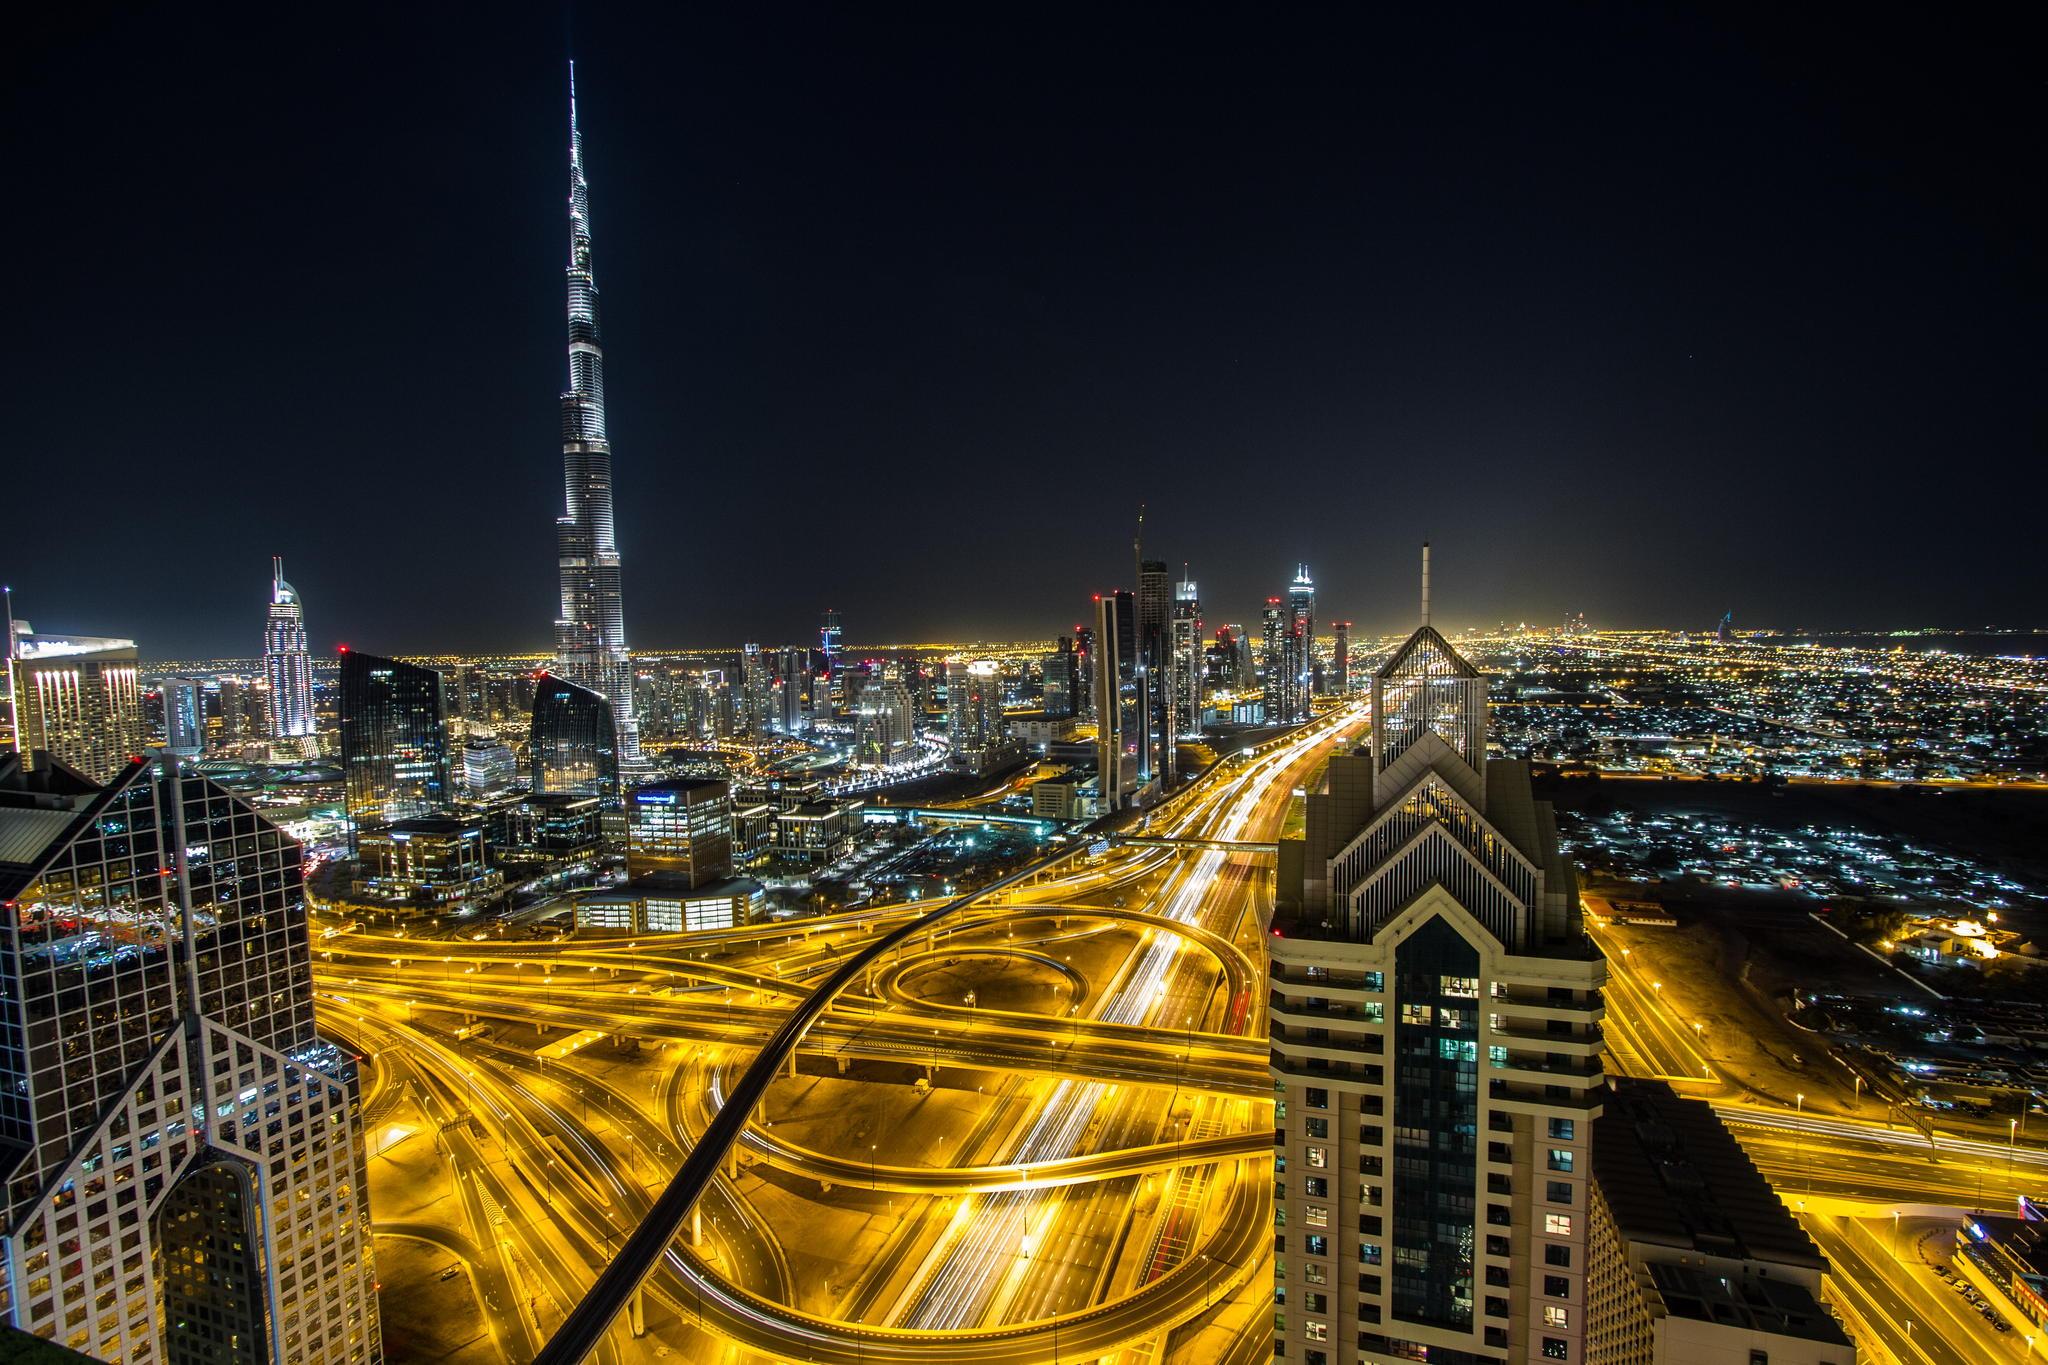 View of Burj Khalifa, United Arab Emirates